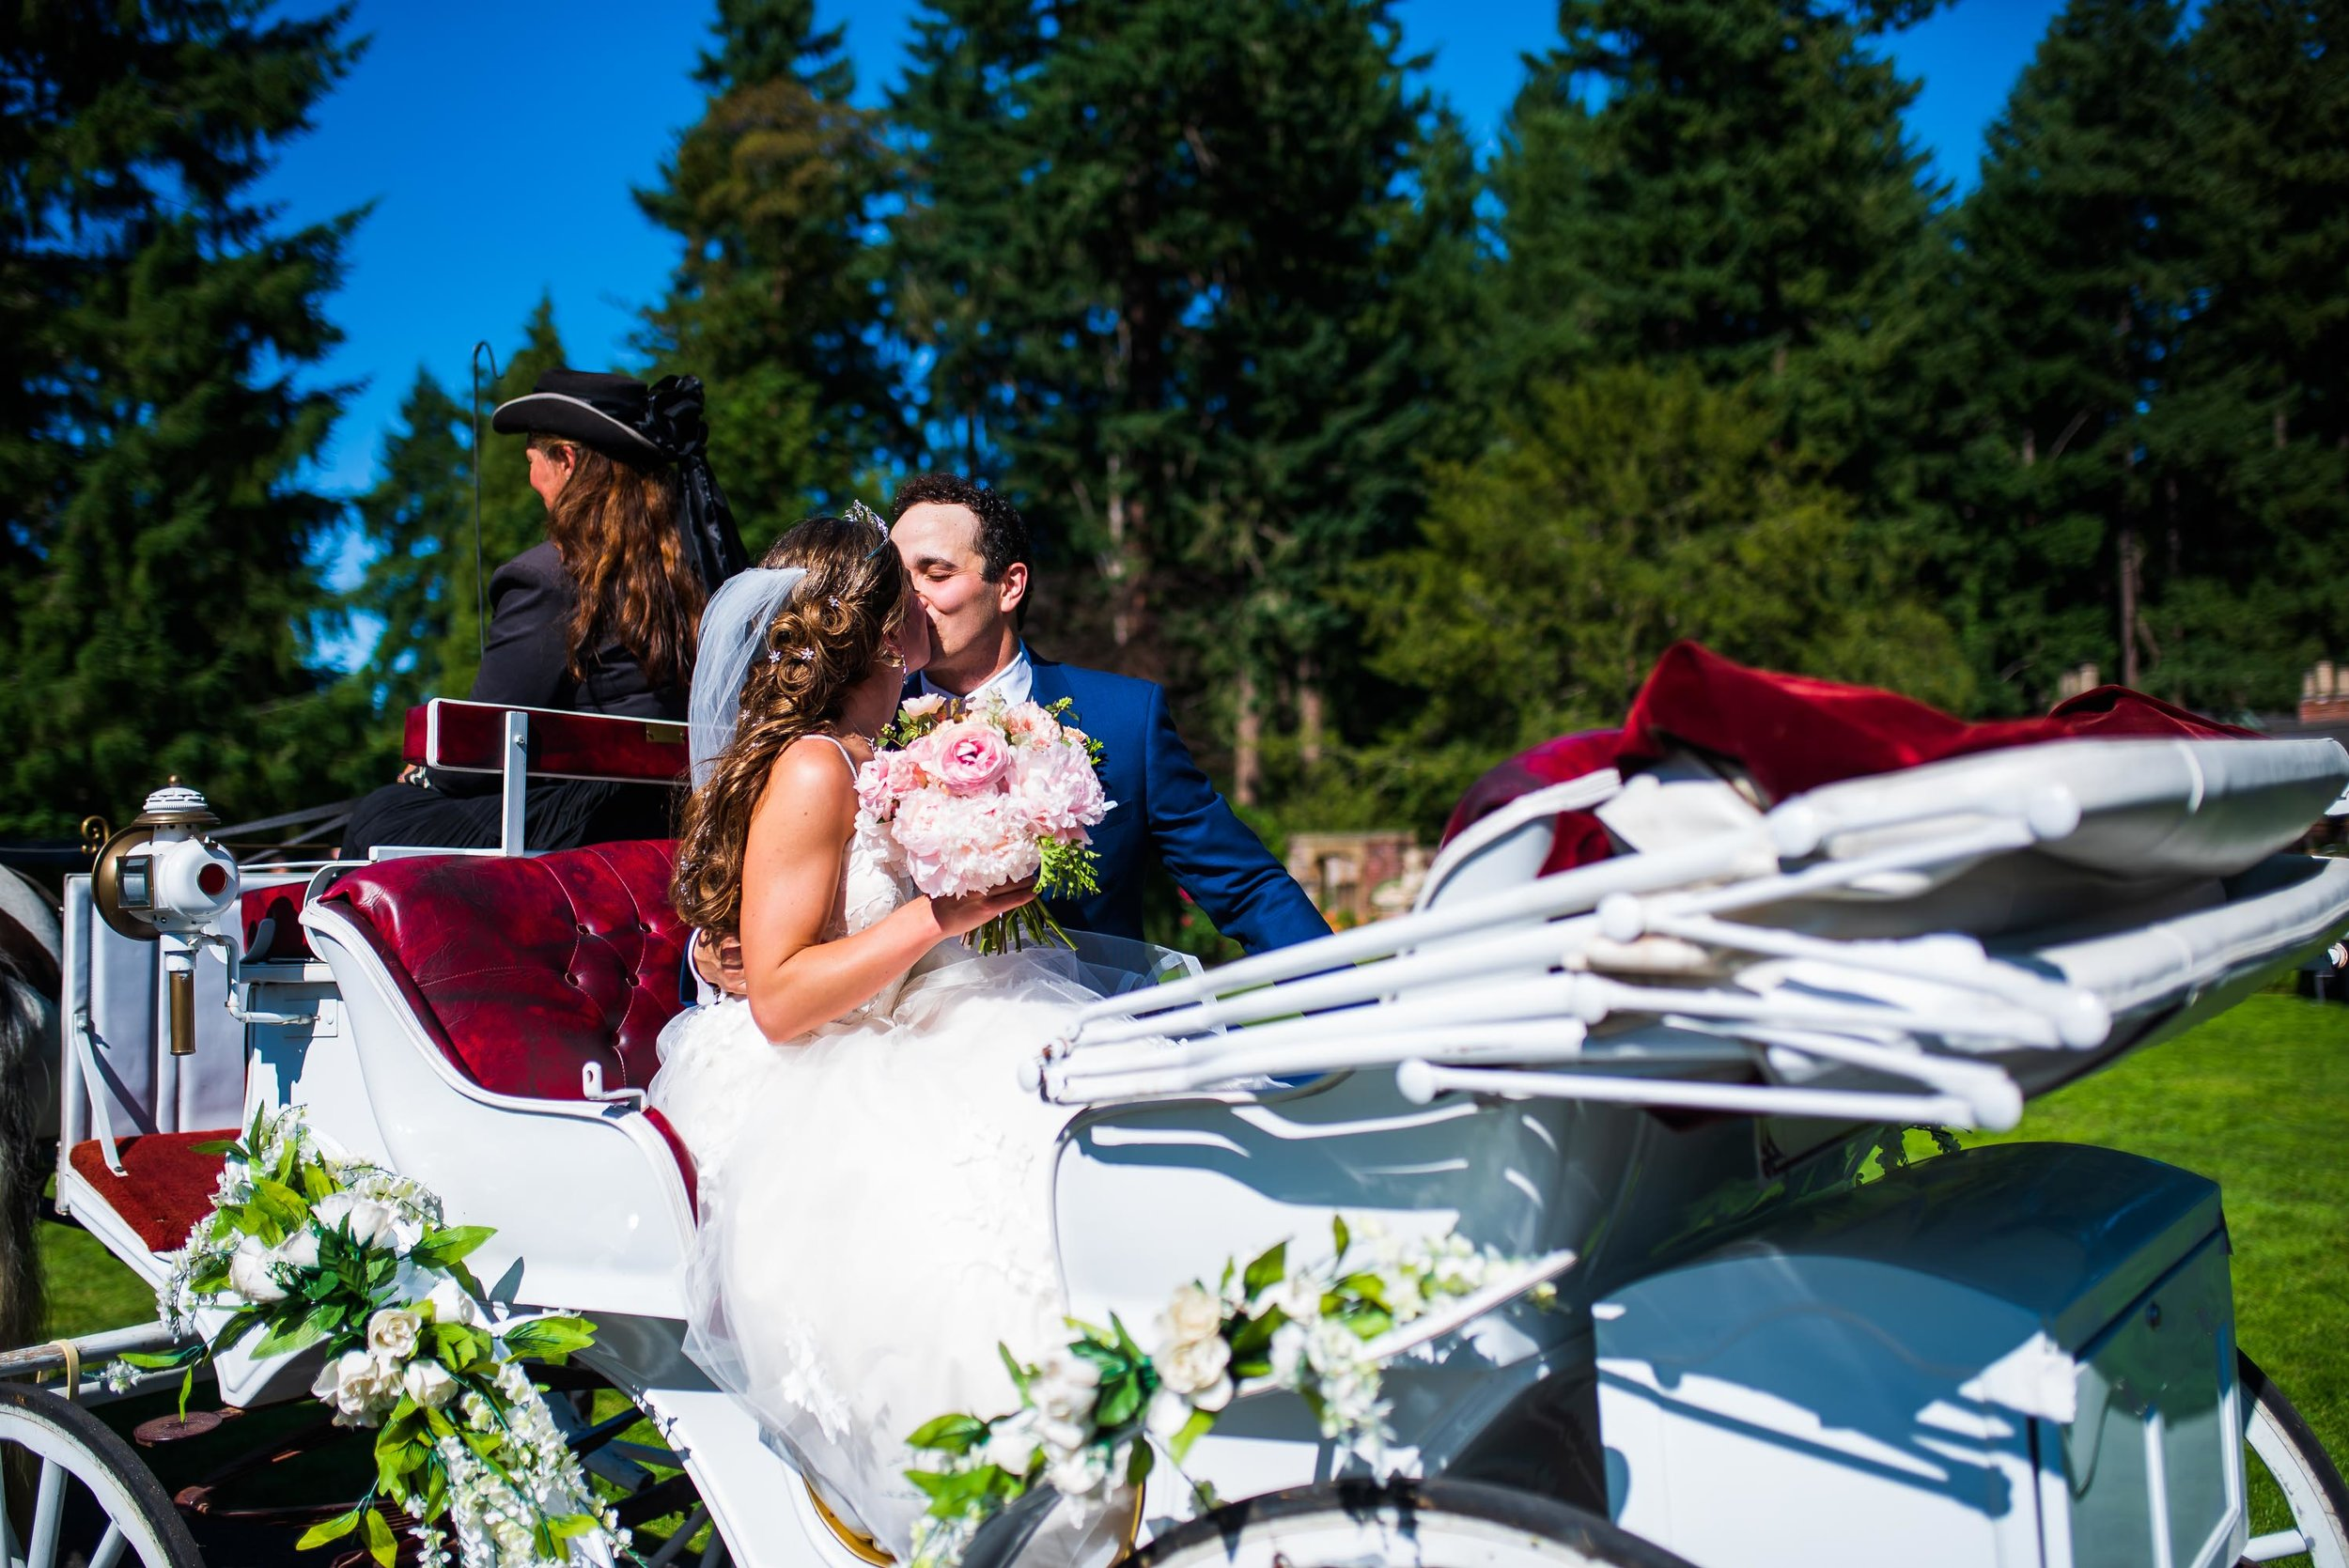 thornewood castle wedding 52.jpg